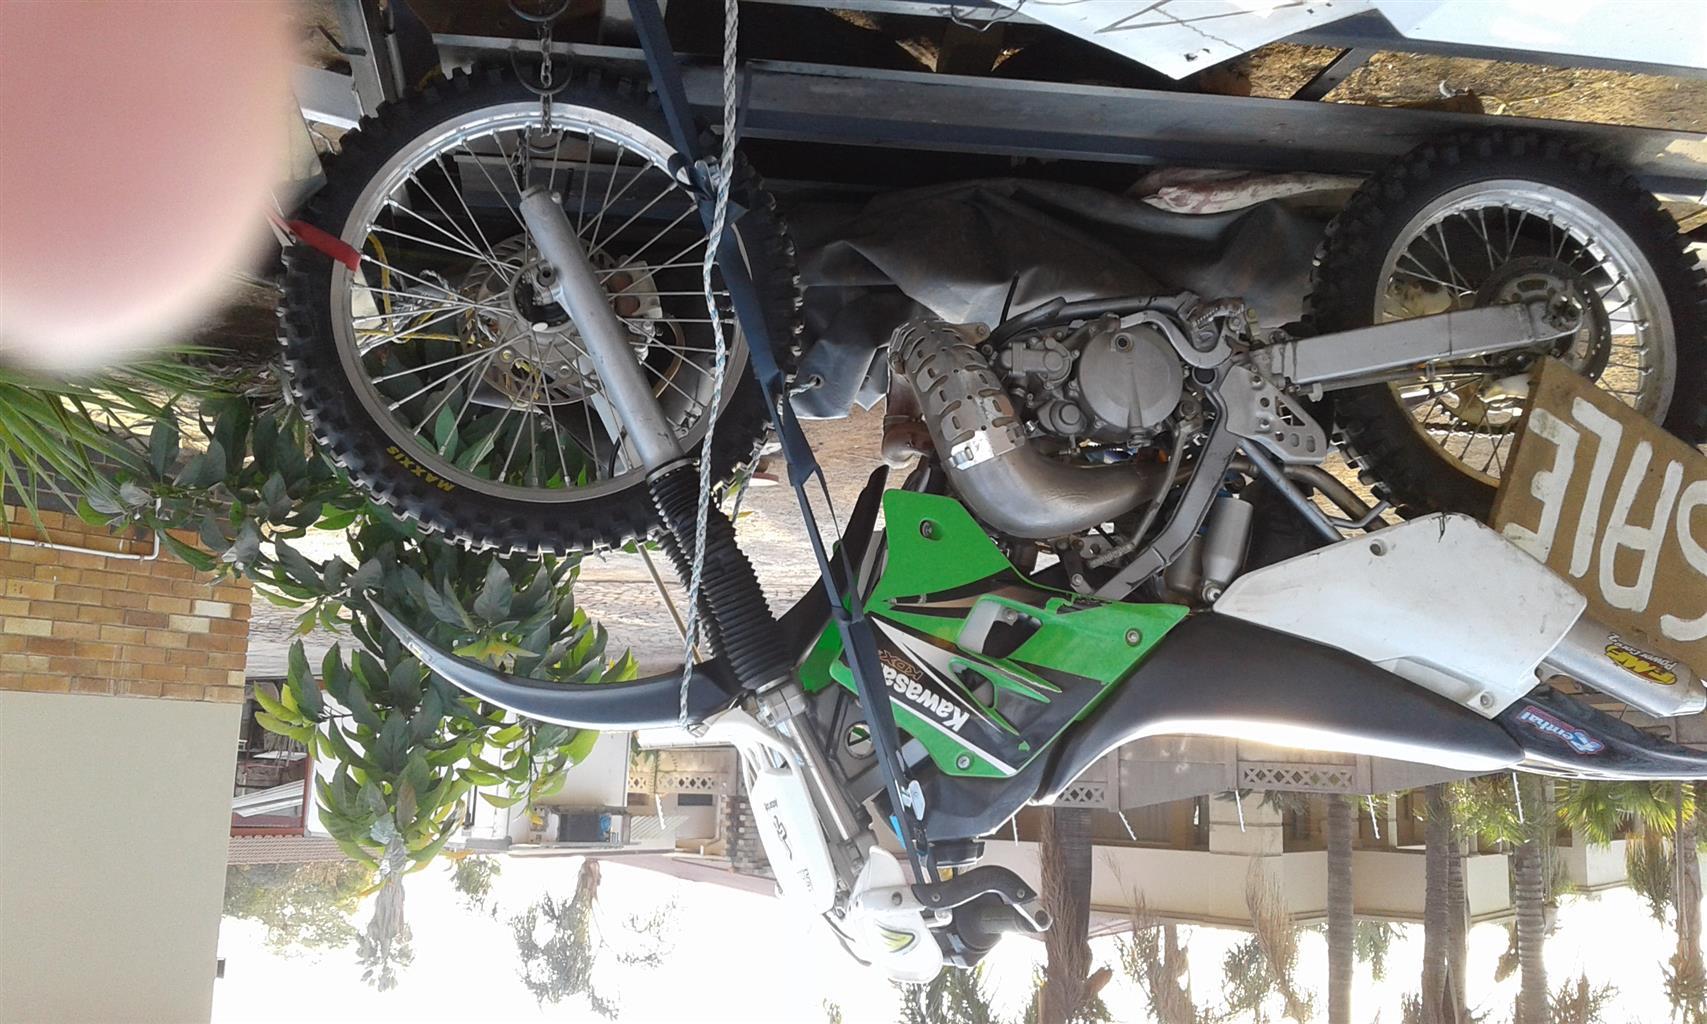 2002 Kawasaki KDX200H